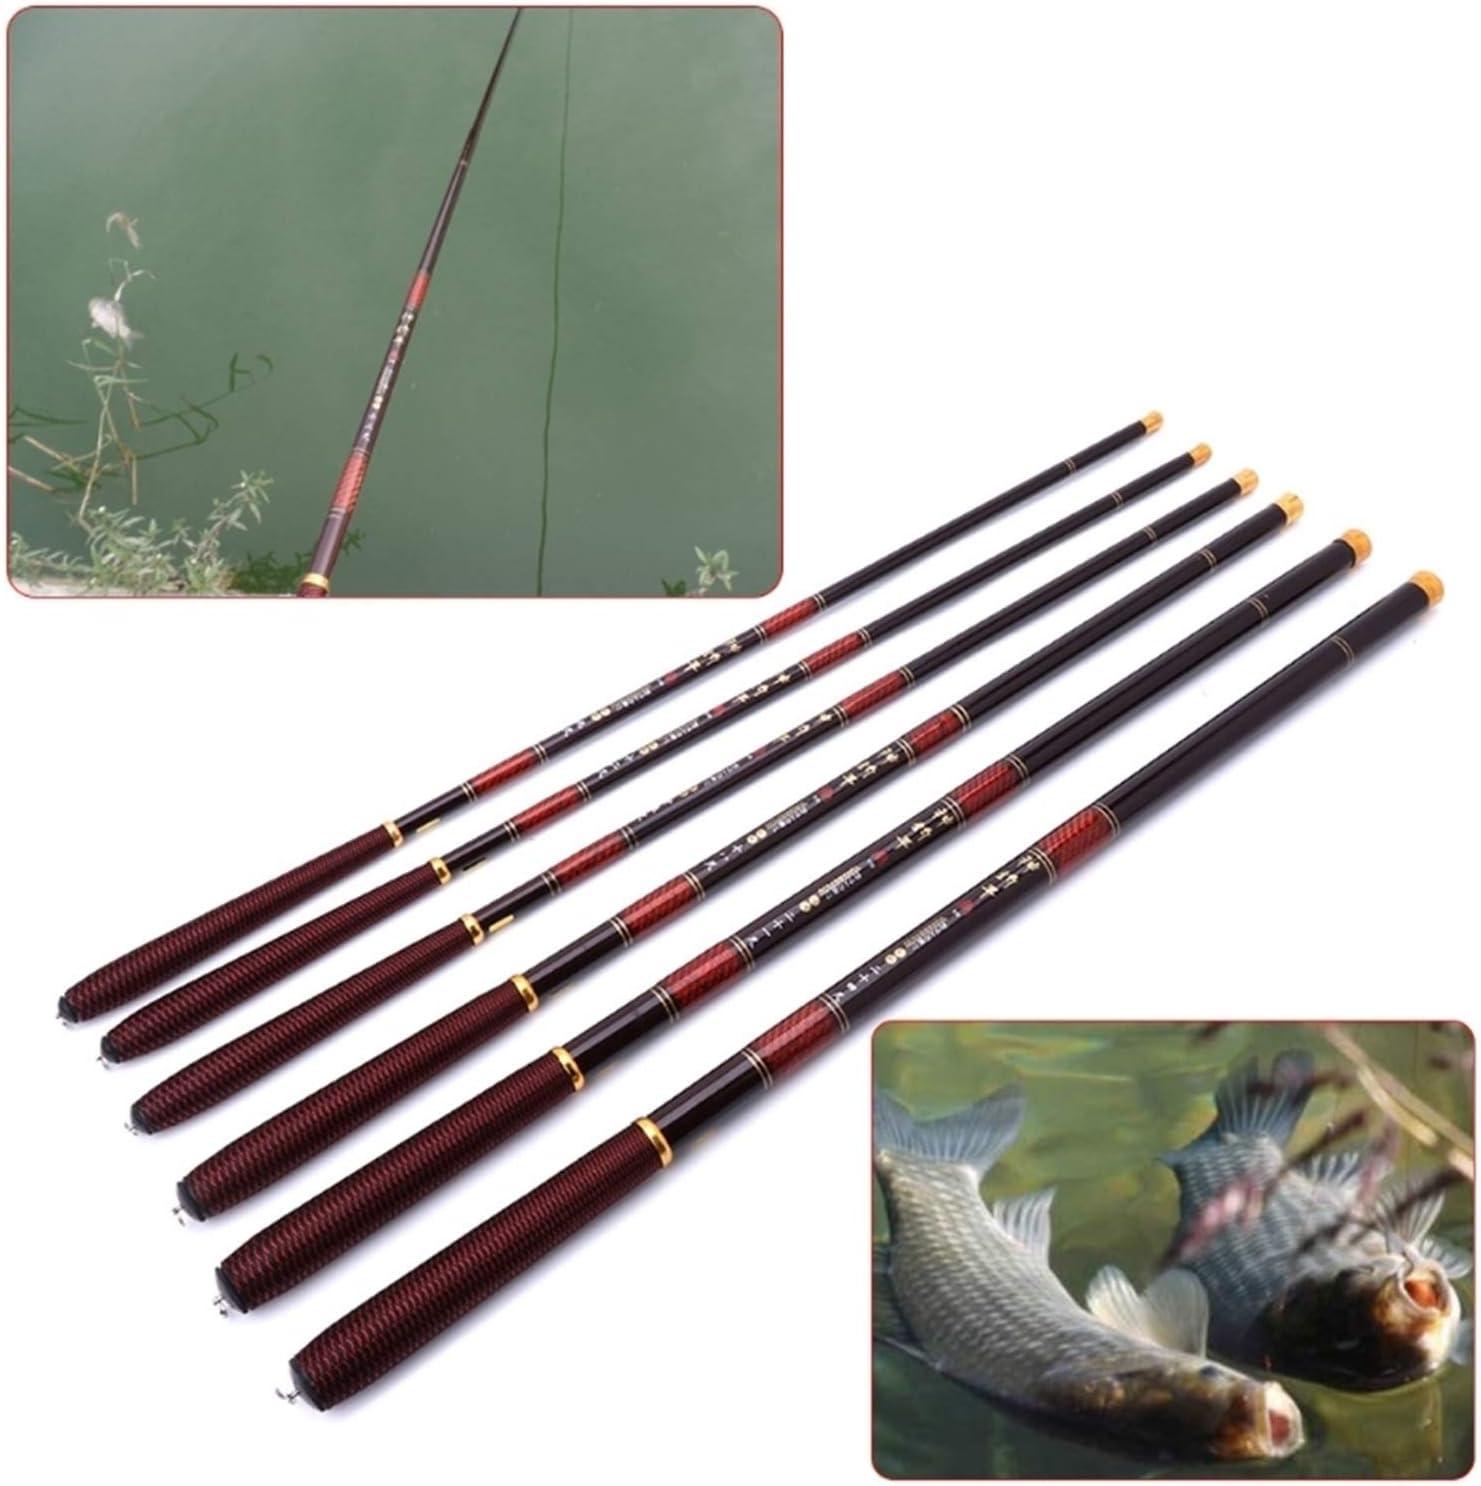 Max 74% OFF VIAIA Fishing Rod 2.7-7.2m Pole High Carbon Ultra Reservation Light Te Fiber